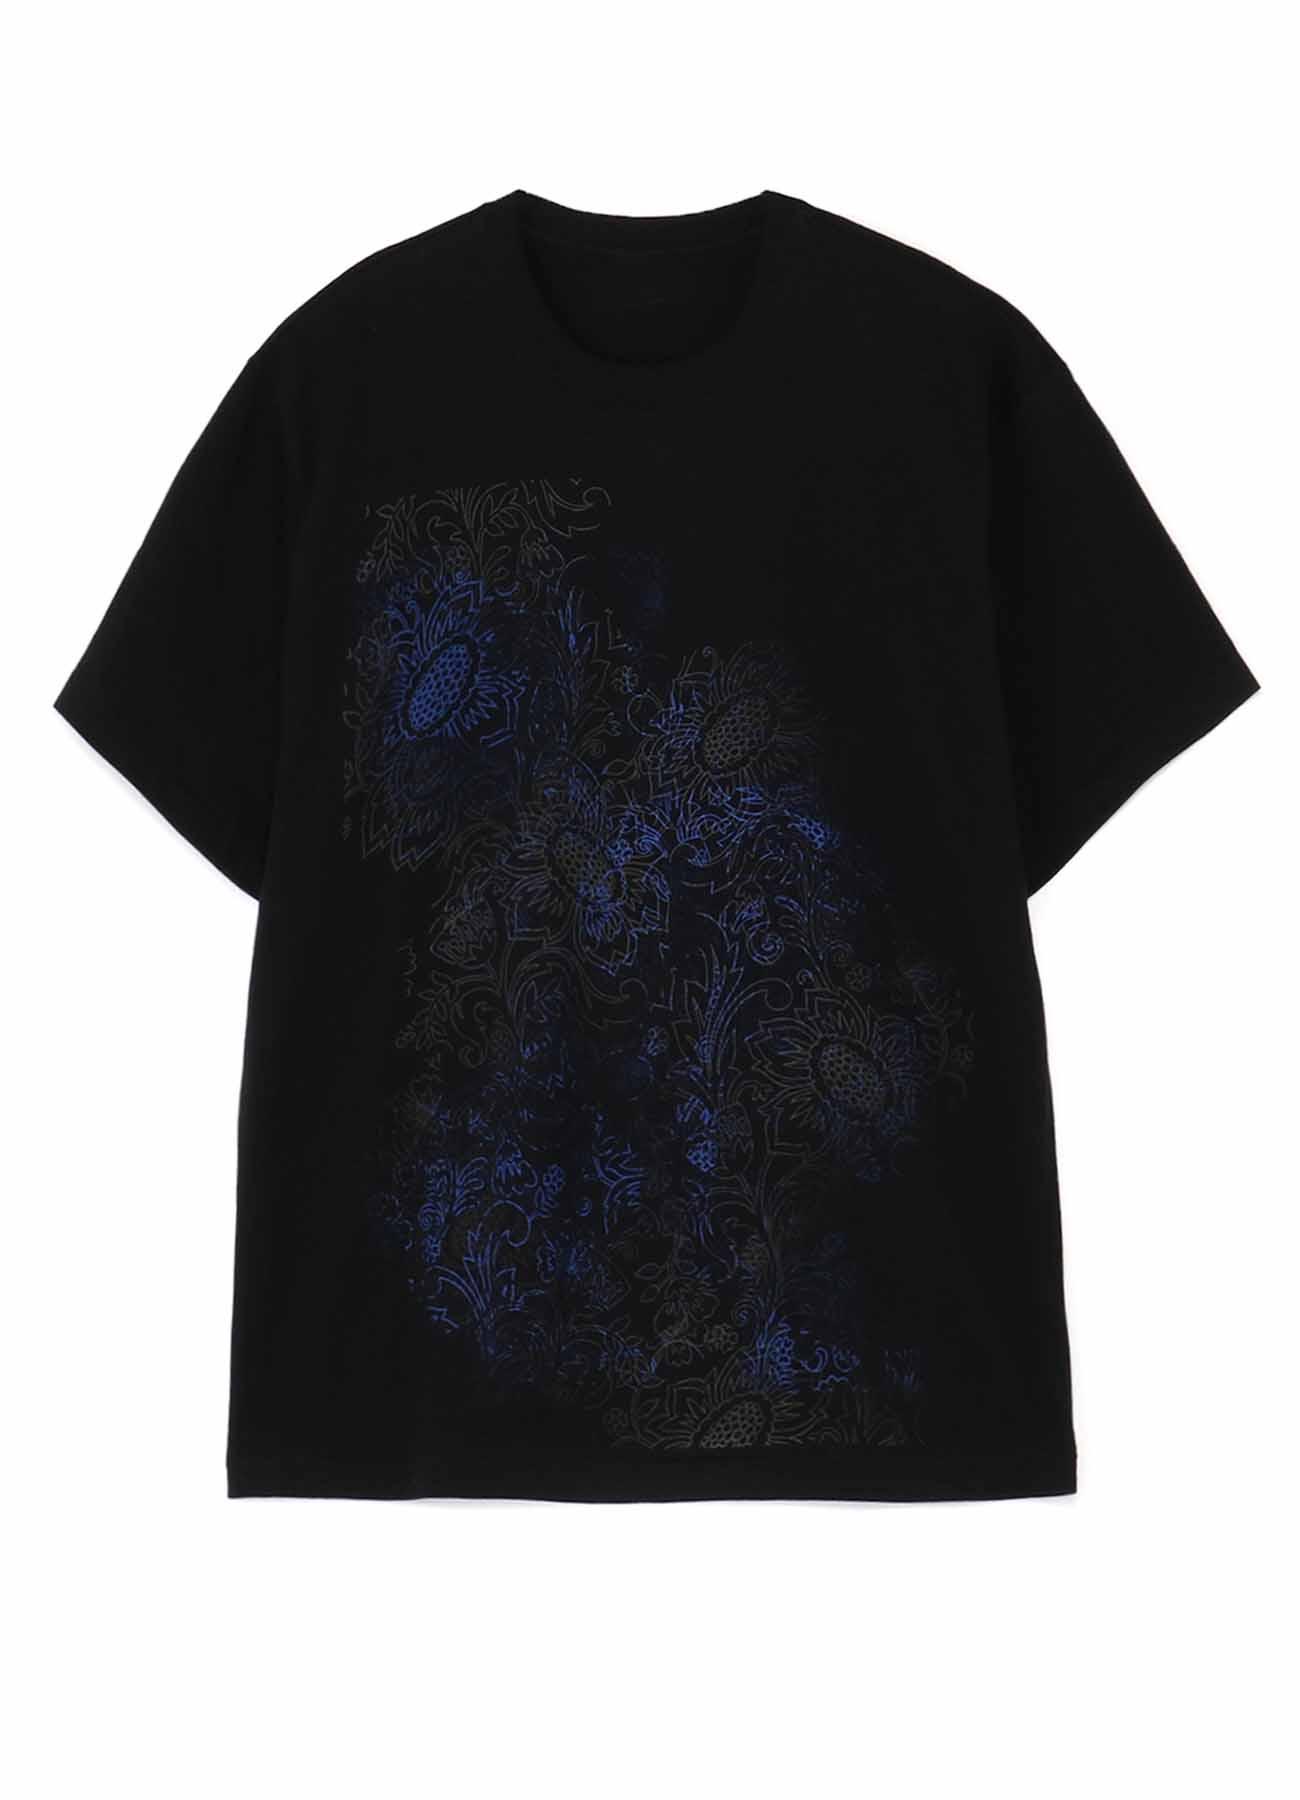 20/CottonJersey Batik Blue T-Shirt